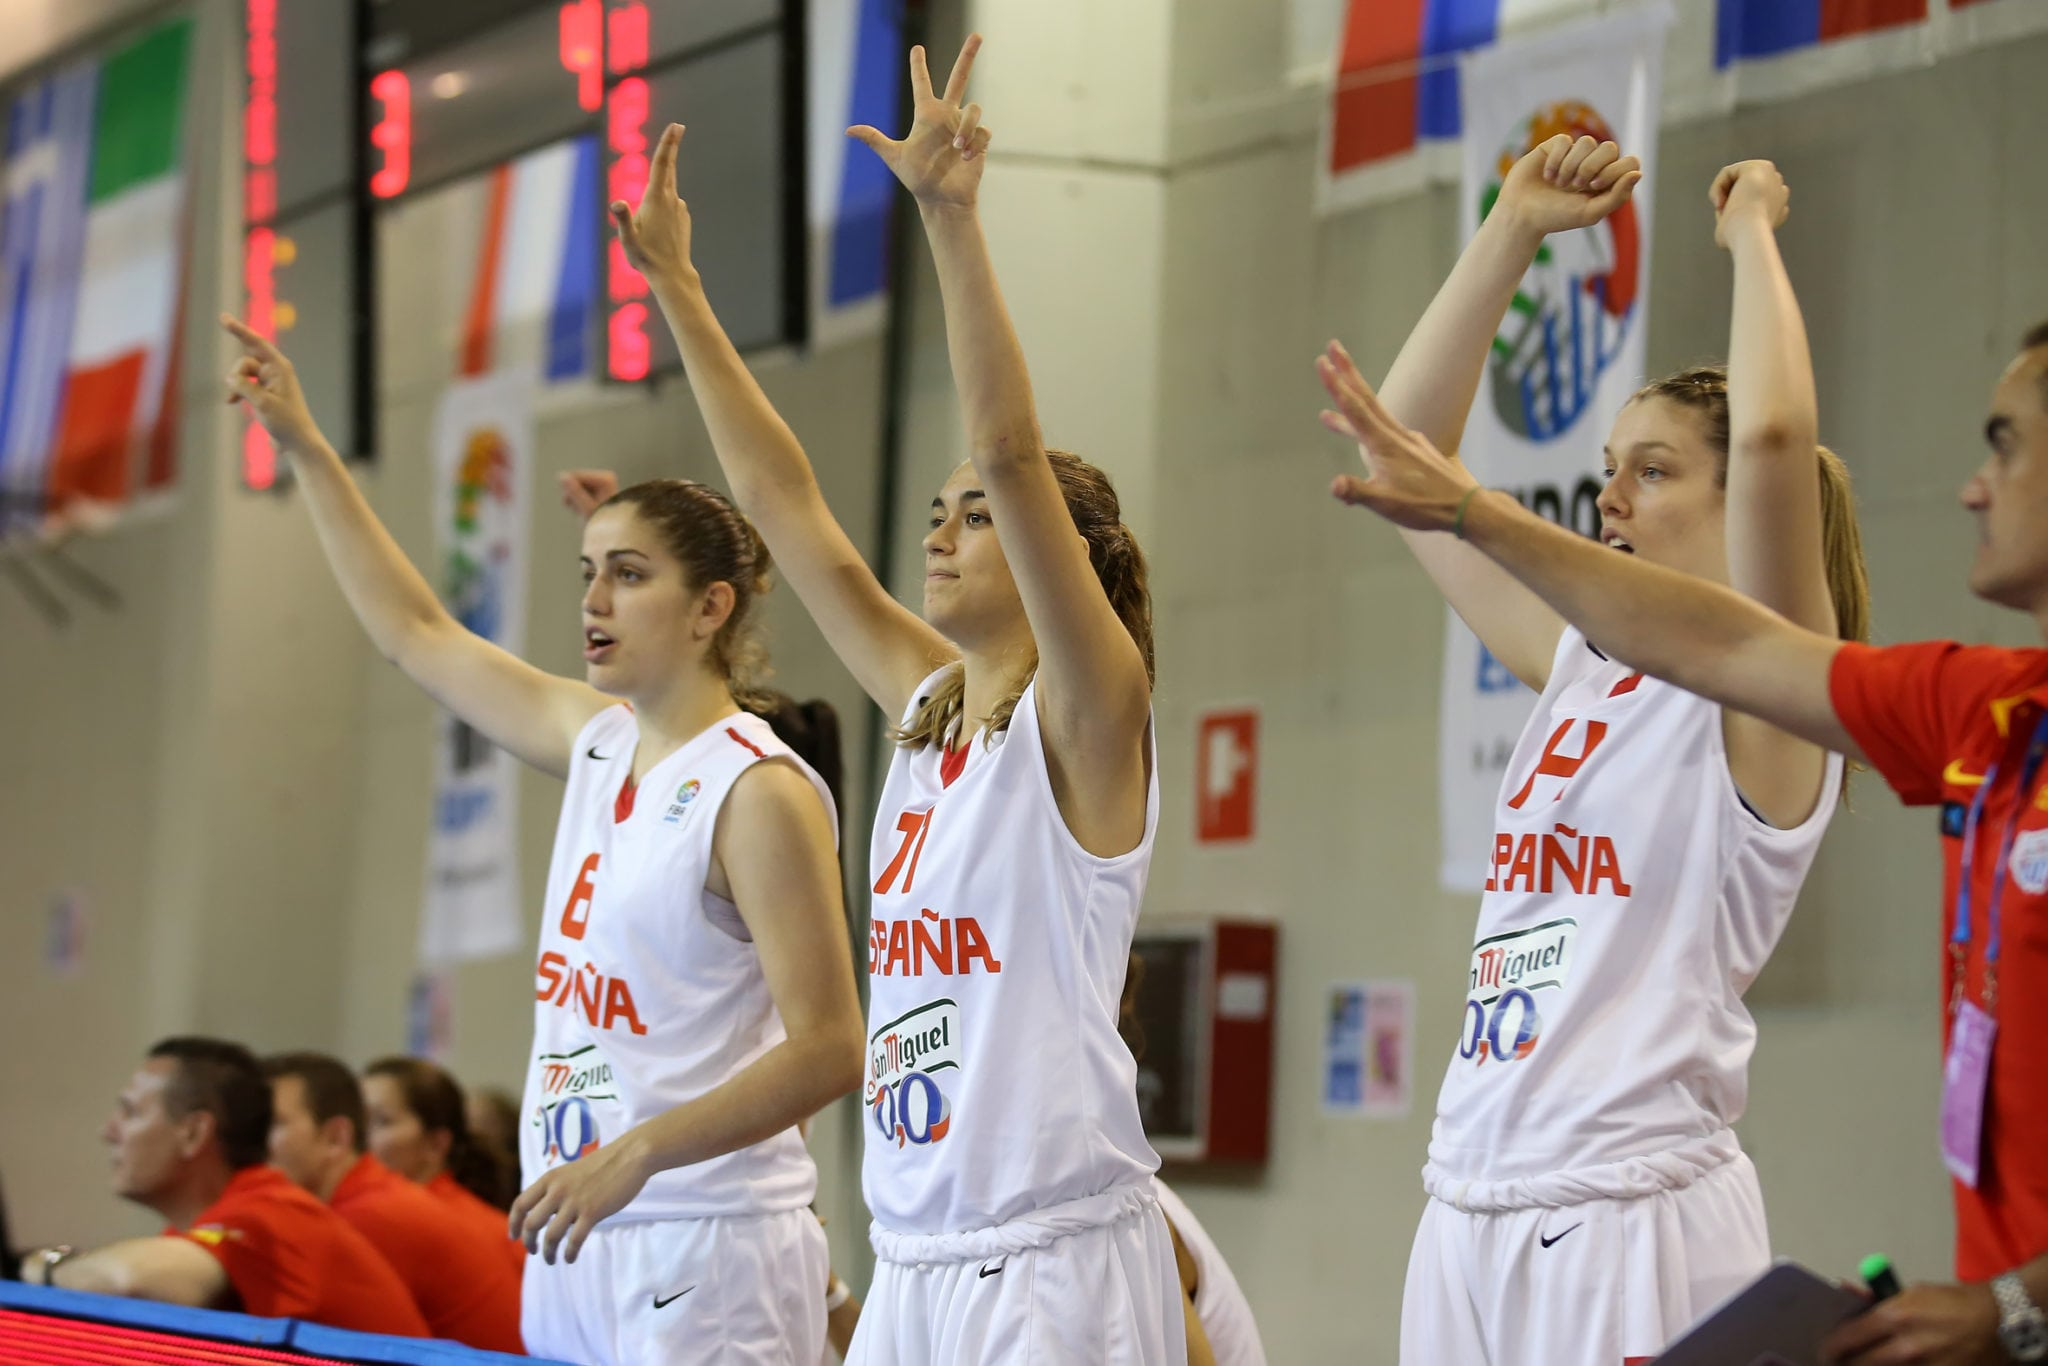 La selección U20F pasa a cuartos de final como primera de grupo tras vencer a Turquía (61-40)